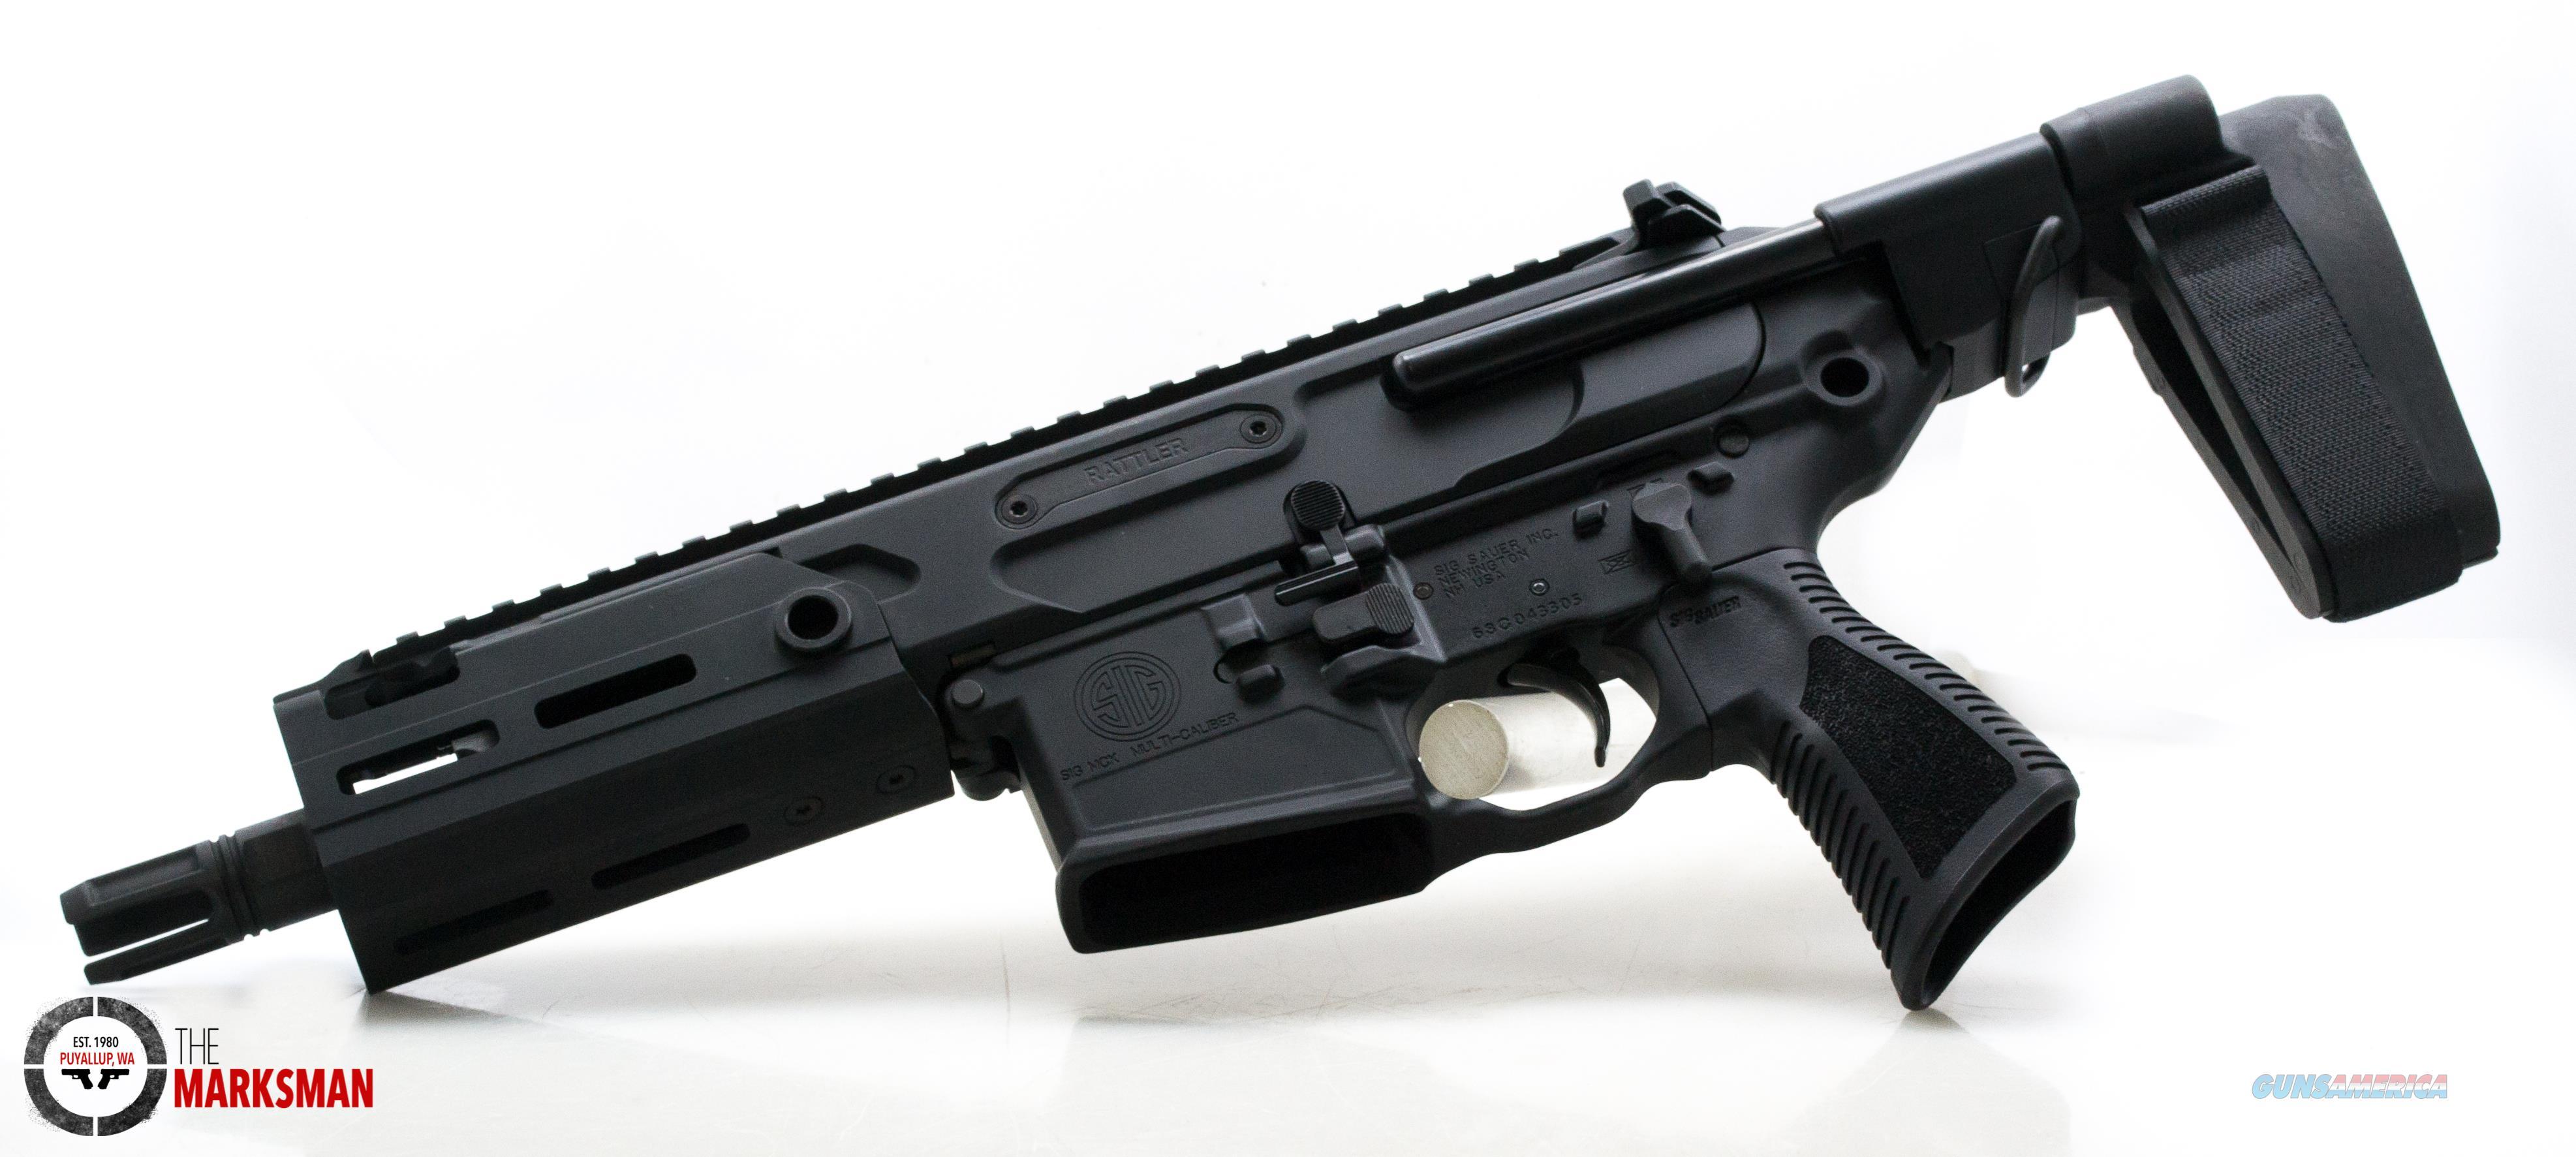 Sig Sauer MCX Rattler Pistol, .300 Blackout NEW Telescoping Pistol Brace, Free Shipping  Guns > Pistols > Sig - Sauer/Sigarms Pistols > Other